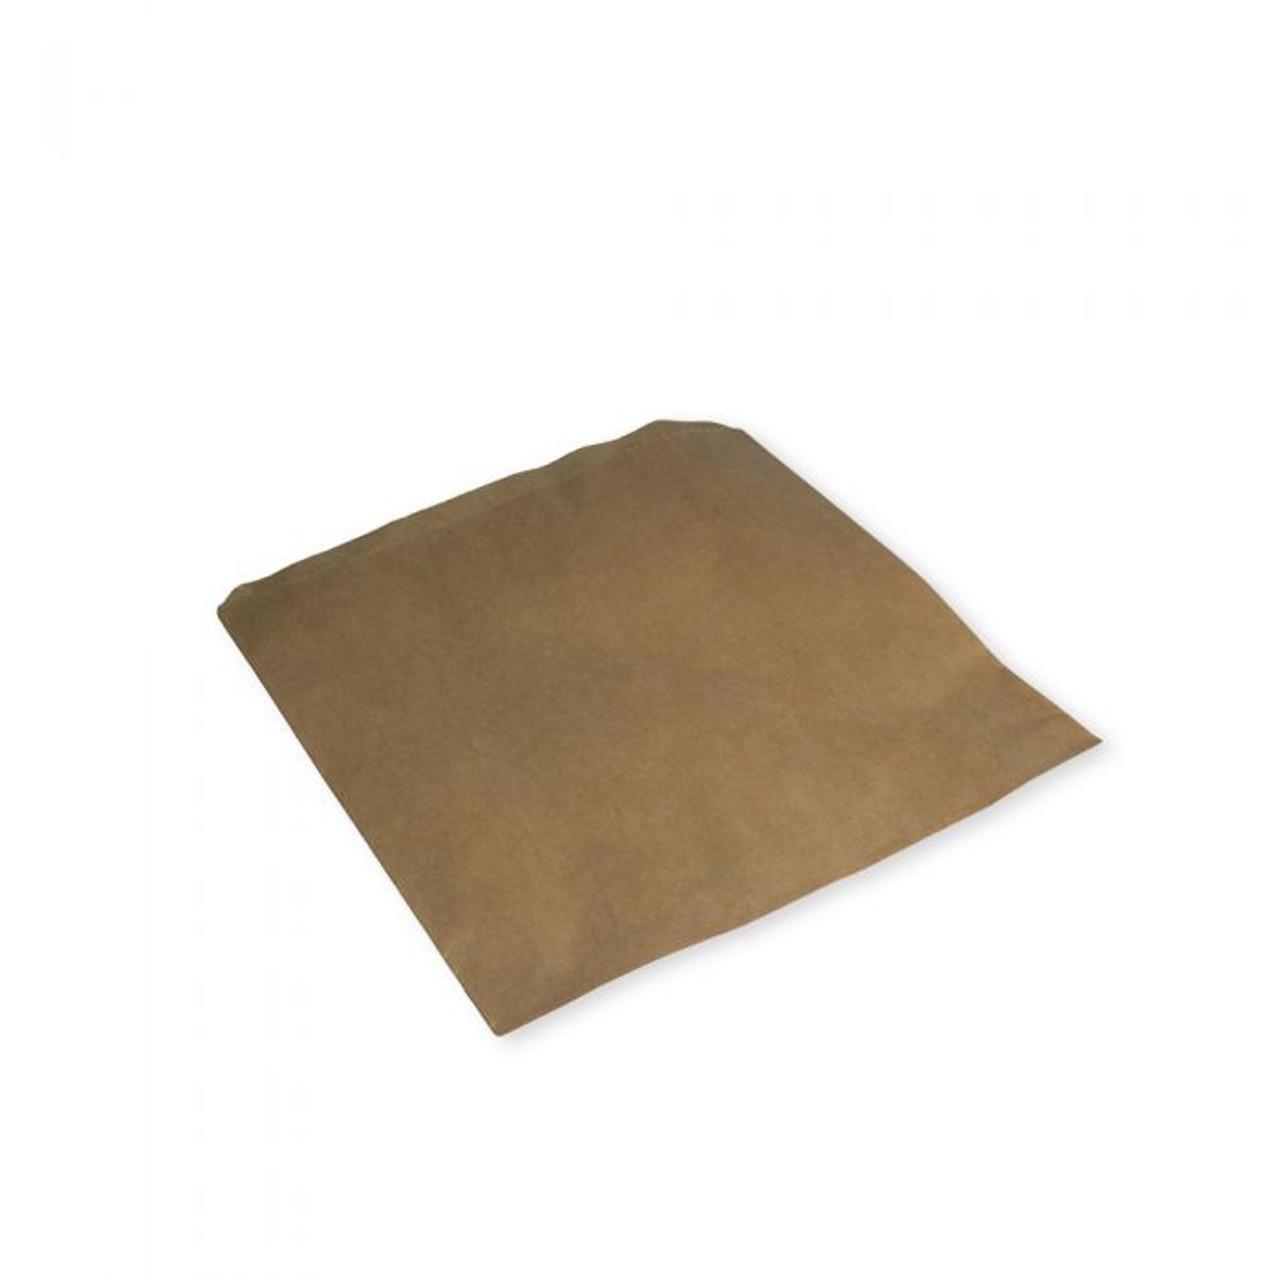 "7"" BROWN KRAFT STRUNG BAGS x 1000"